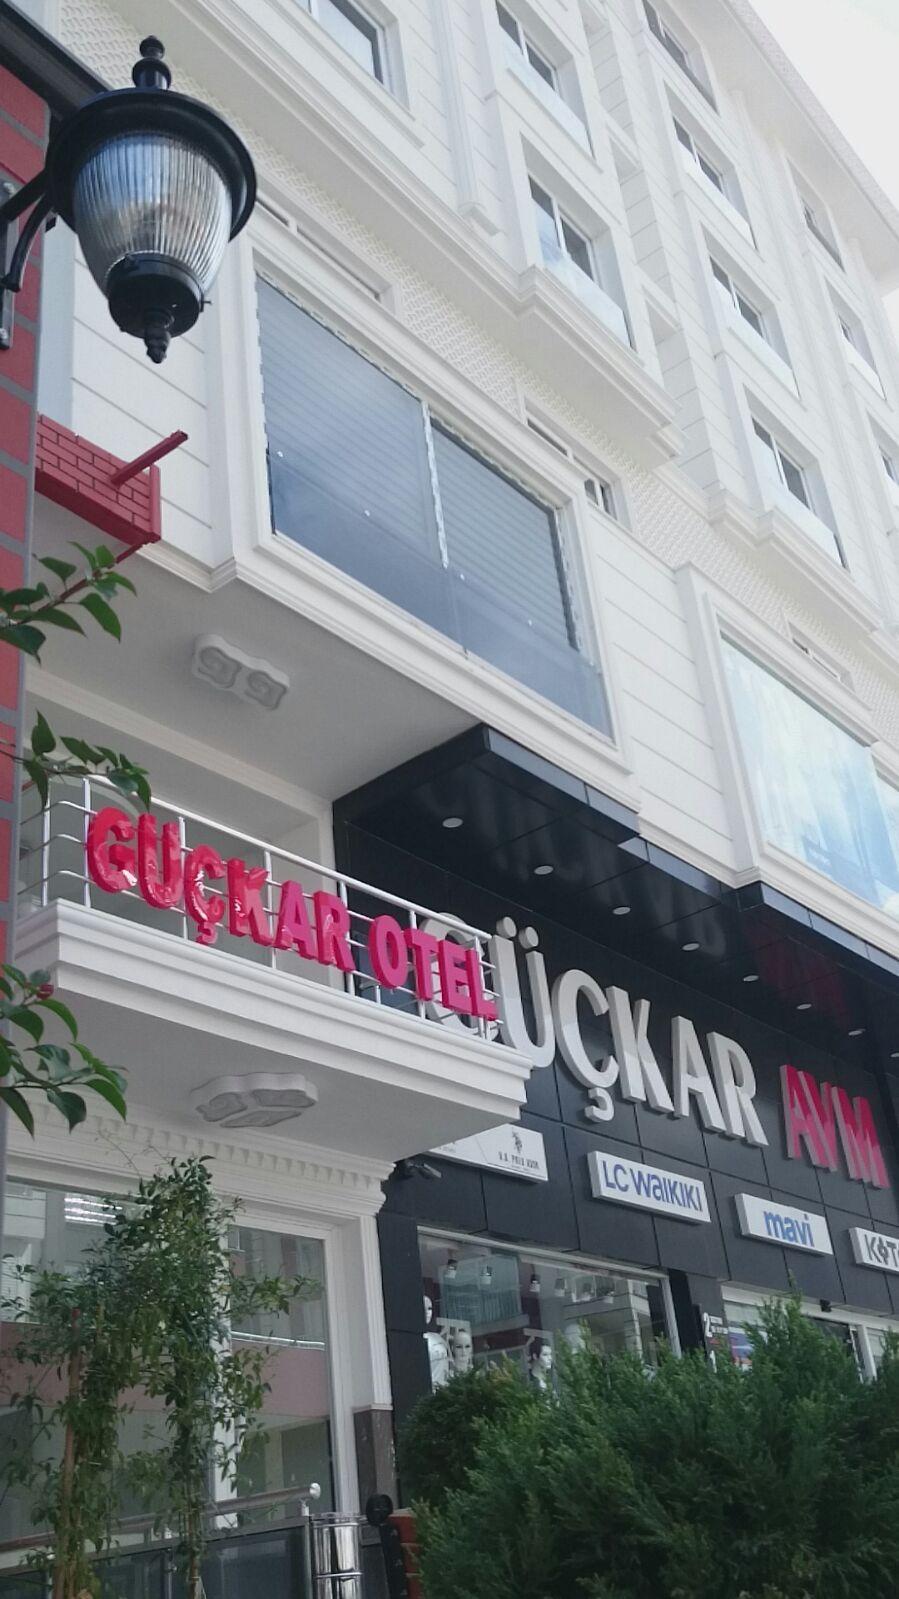 Güçkar şehrinn Oteli Serik Antalya 2 Güçkar şehrinn Oteli